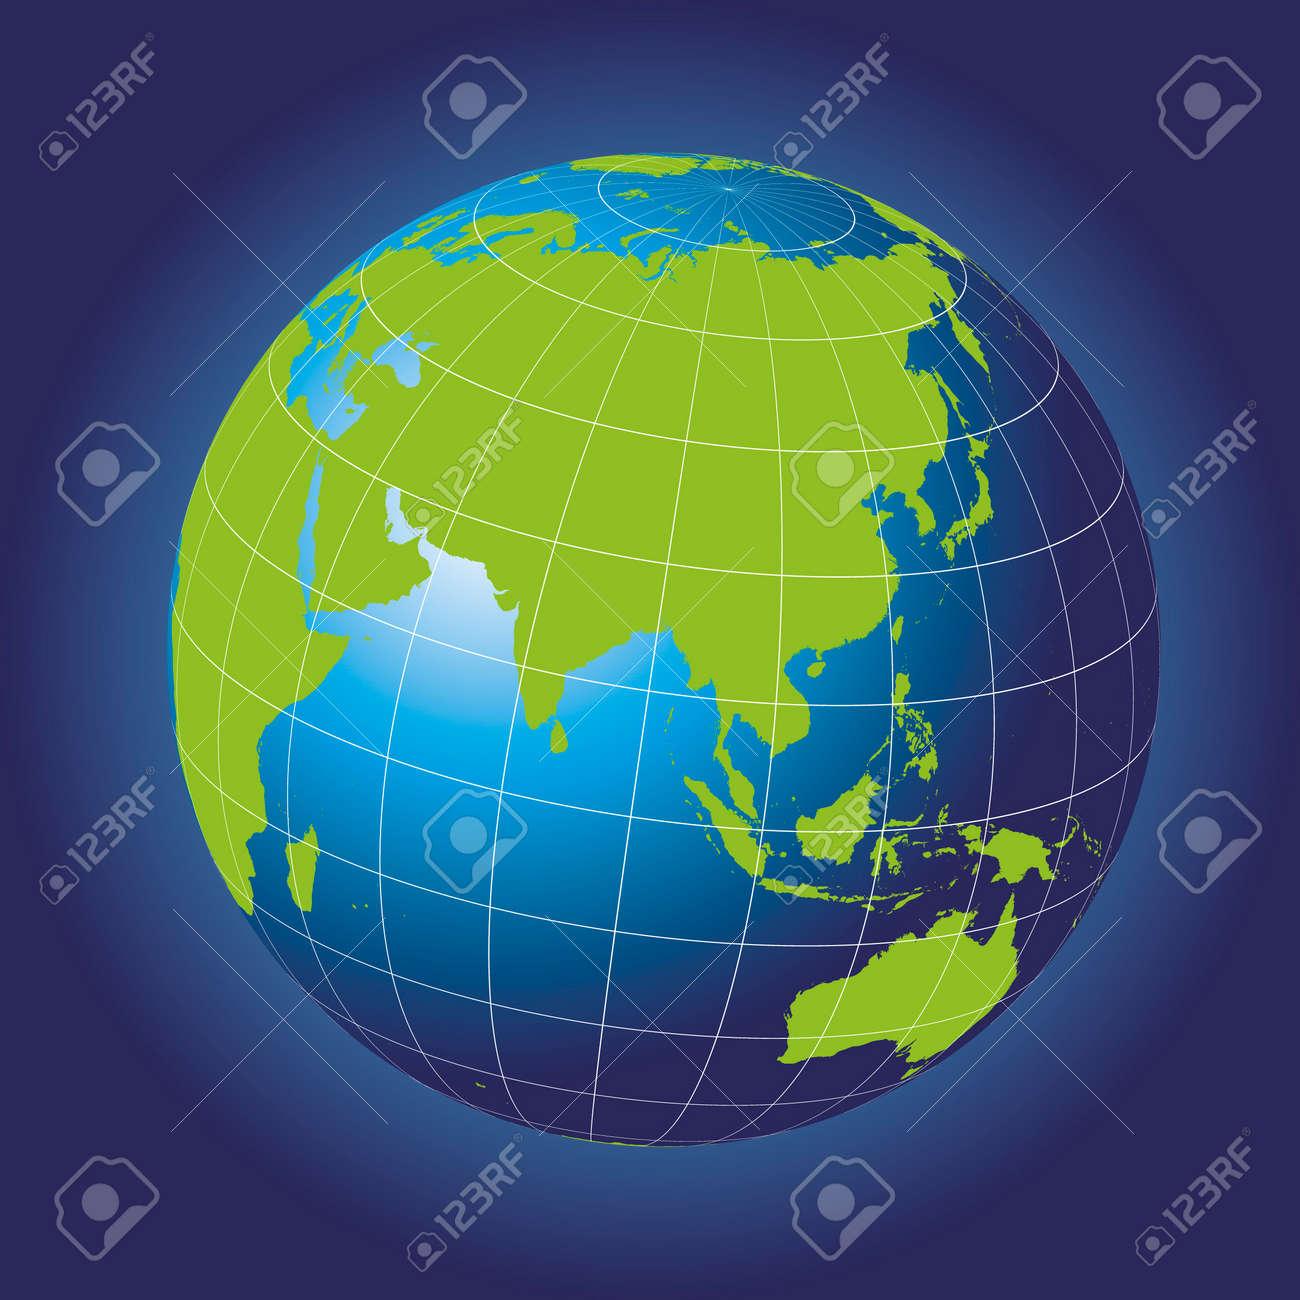 Carte Russie Australie.Carte Asie Australie La Russie L Afrique Pole Nord Globe Terrestre